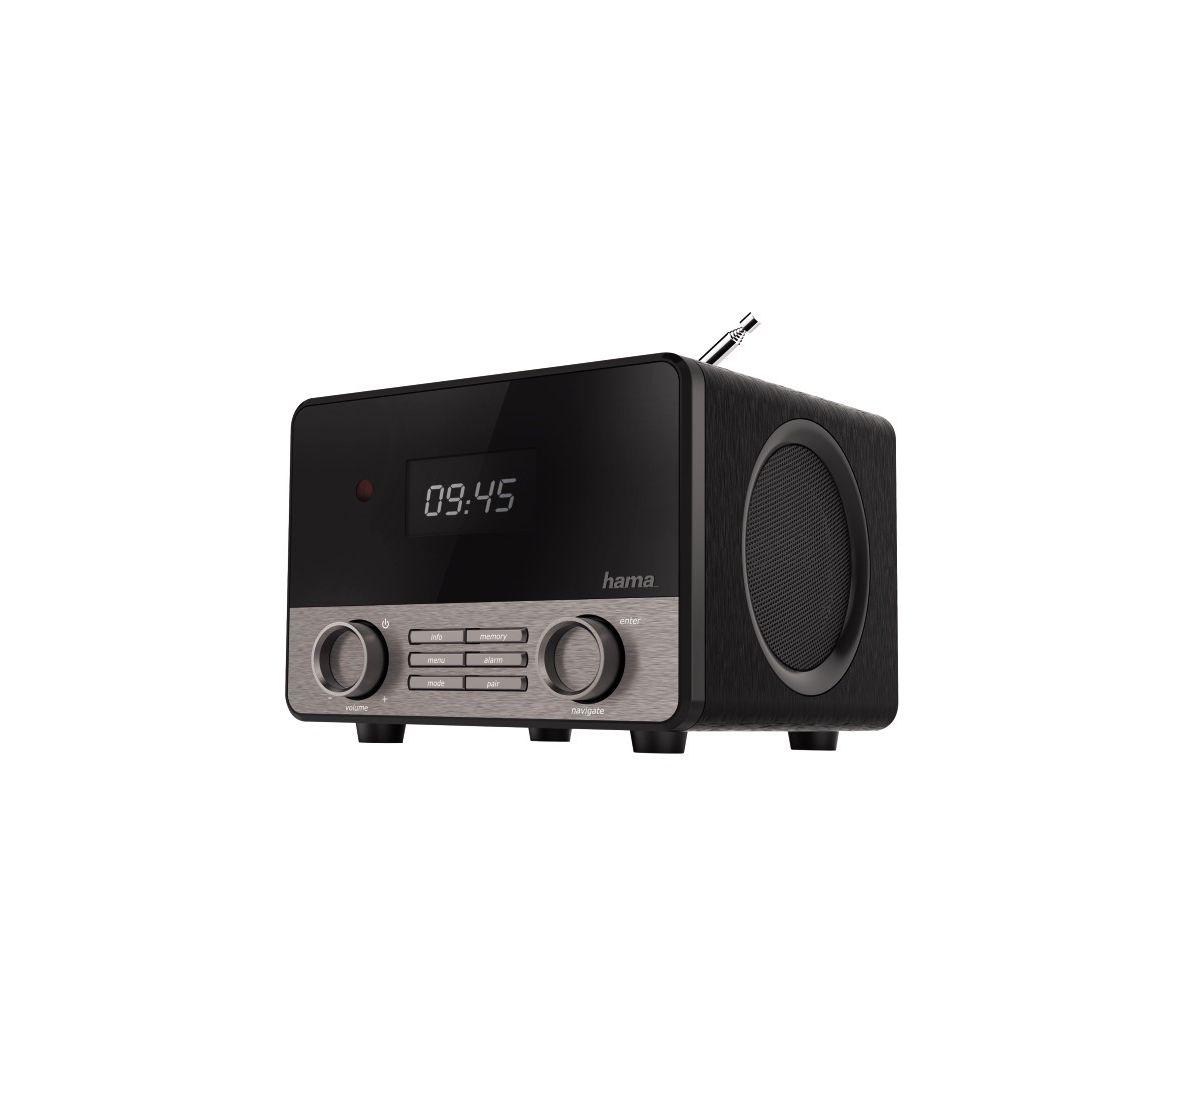 Hama Digitalradio DR1600 Radiowecker Bluetooth ...